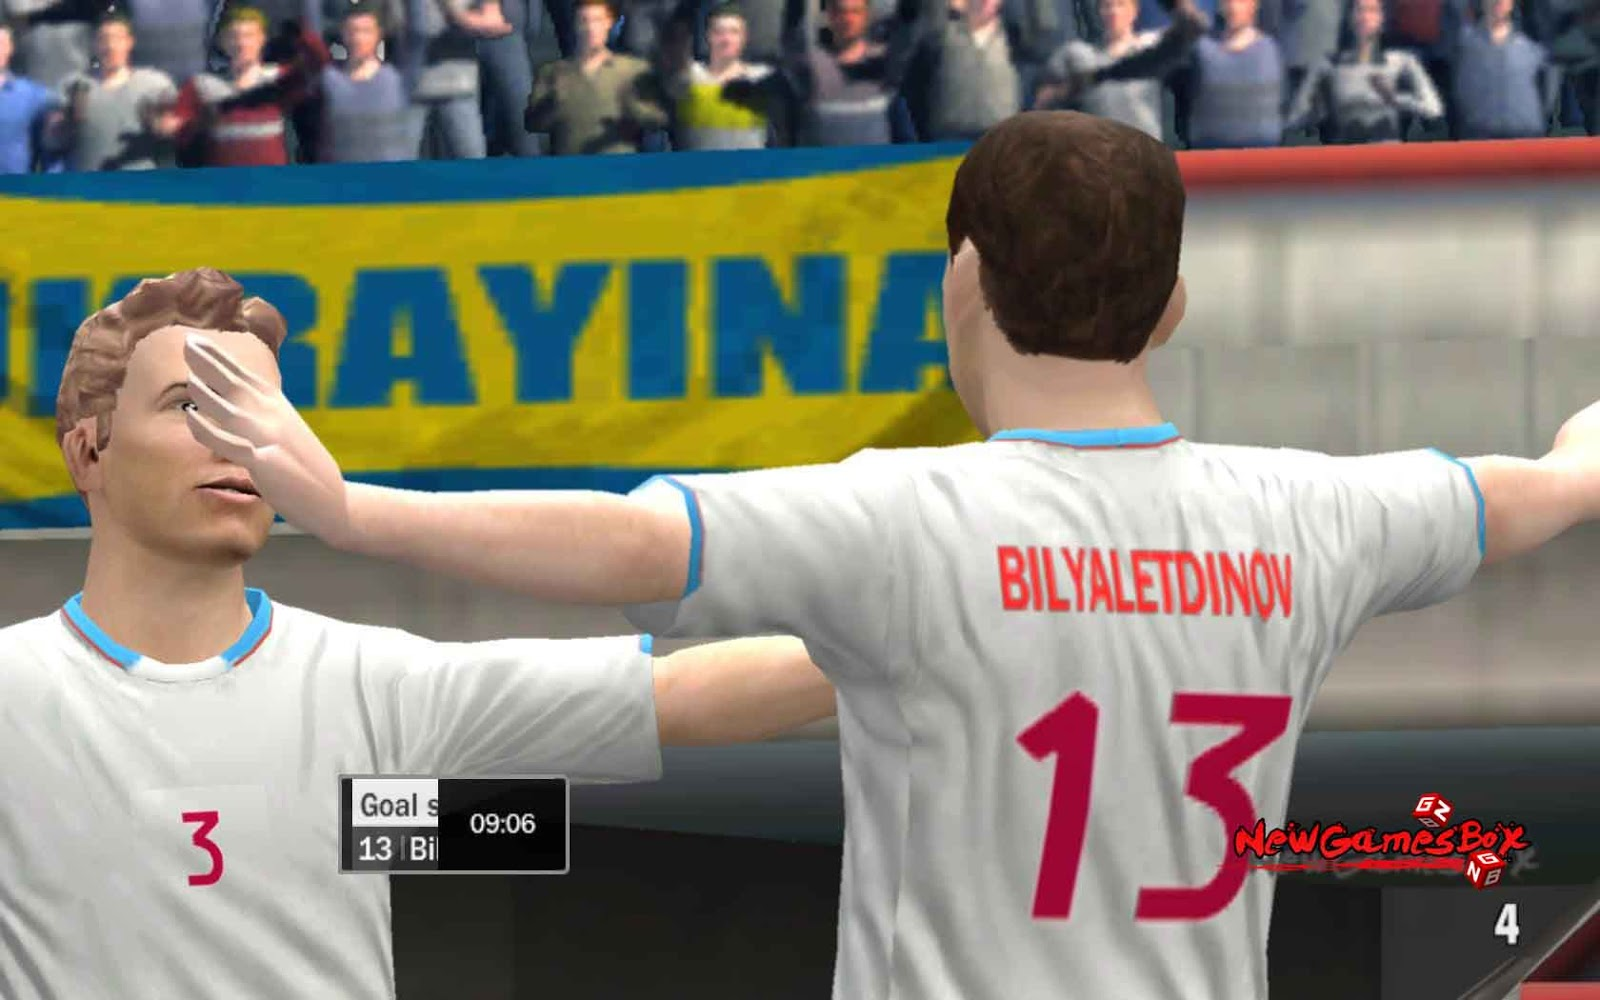 Fifa 09 pl rip mario gomez fifa 18 ratings